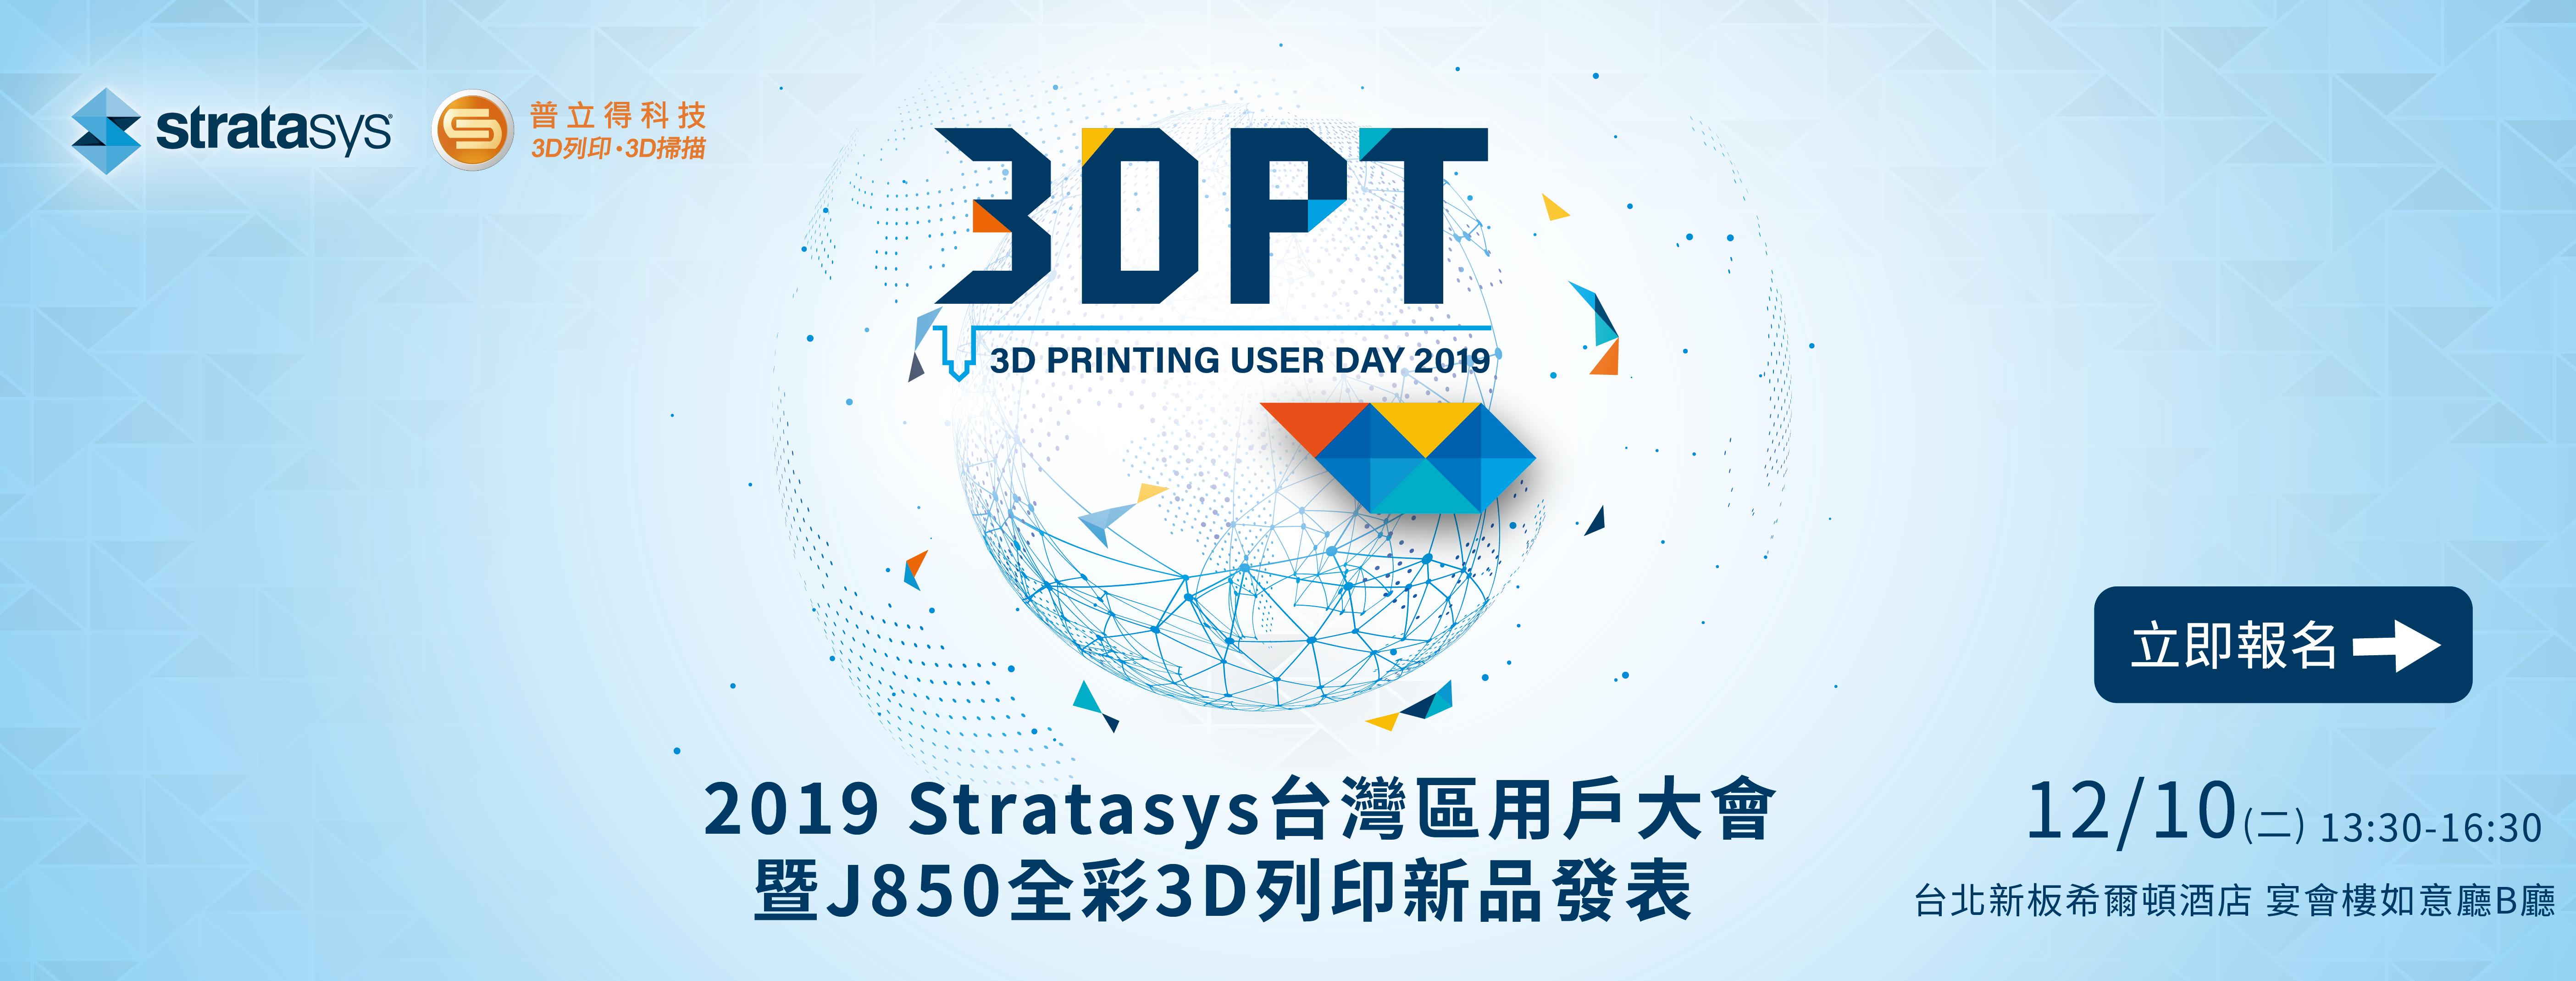 2019 Stratasys 臺灣區用戶大會暨J850全彩3D列印新品發表